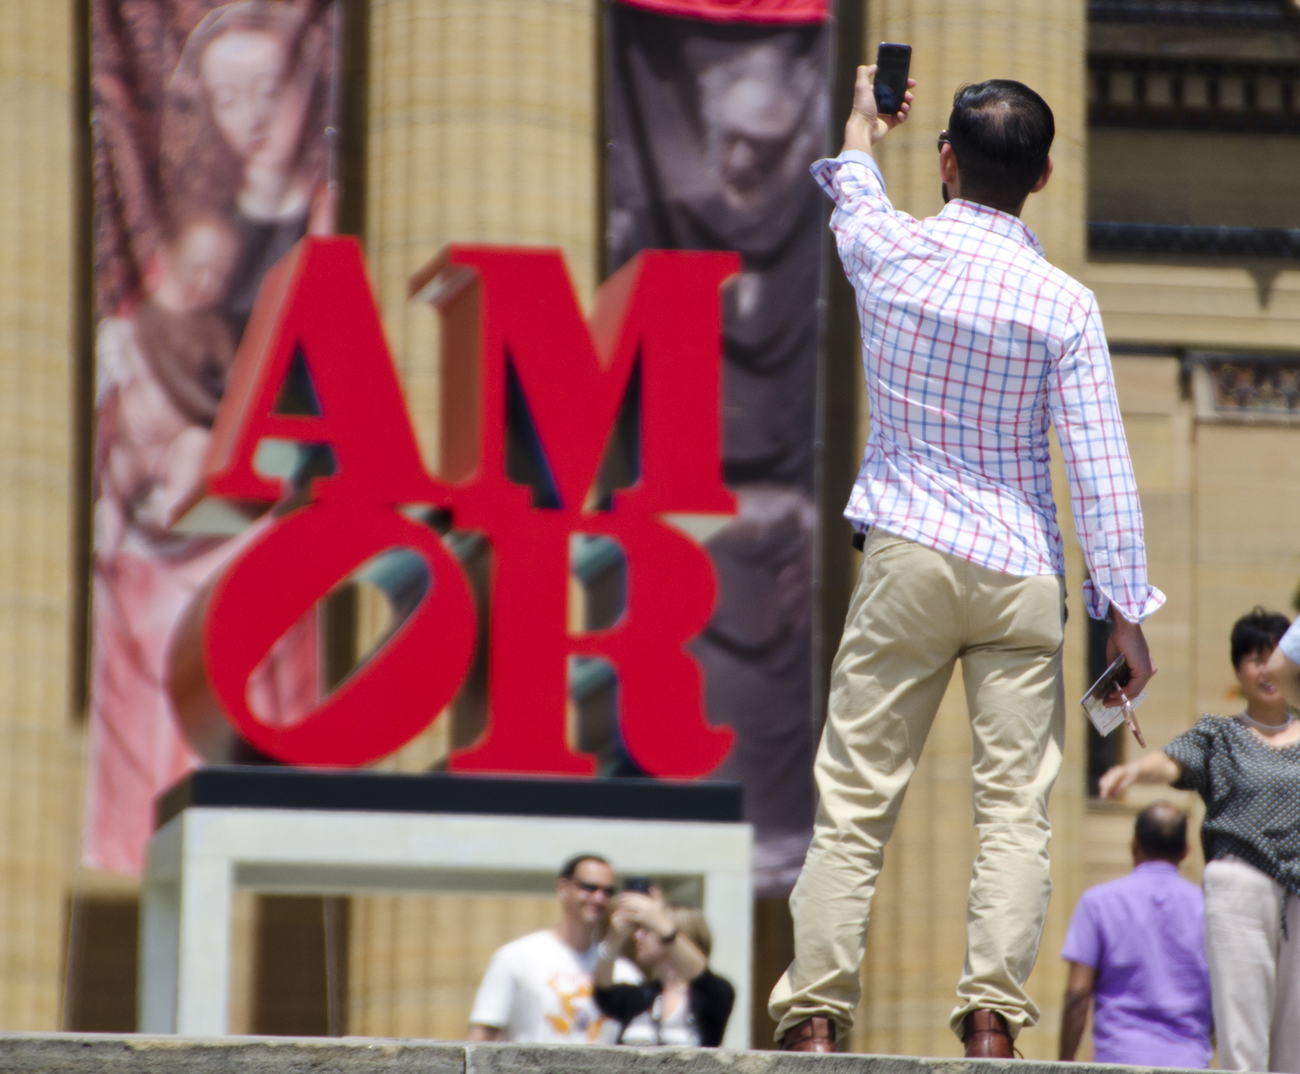 Tourists take photos of AMOR sculpture